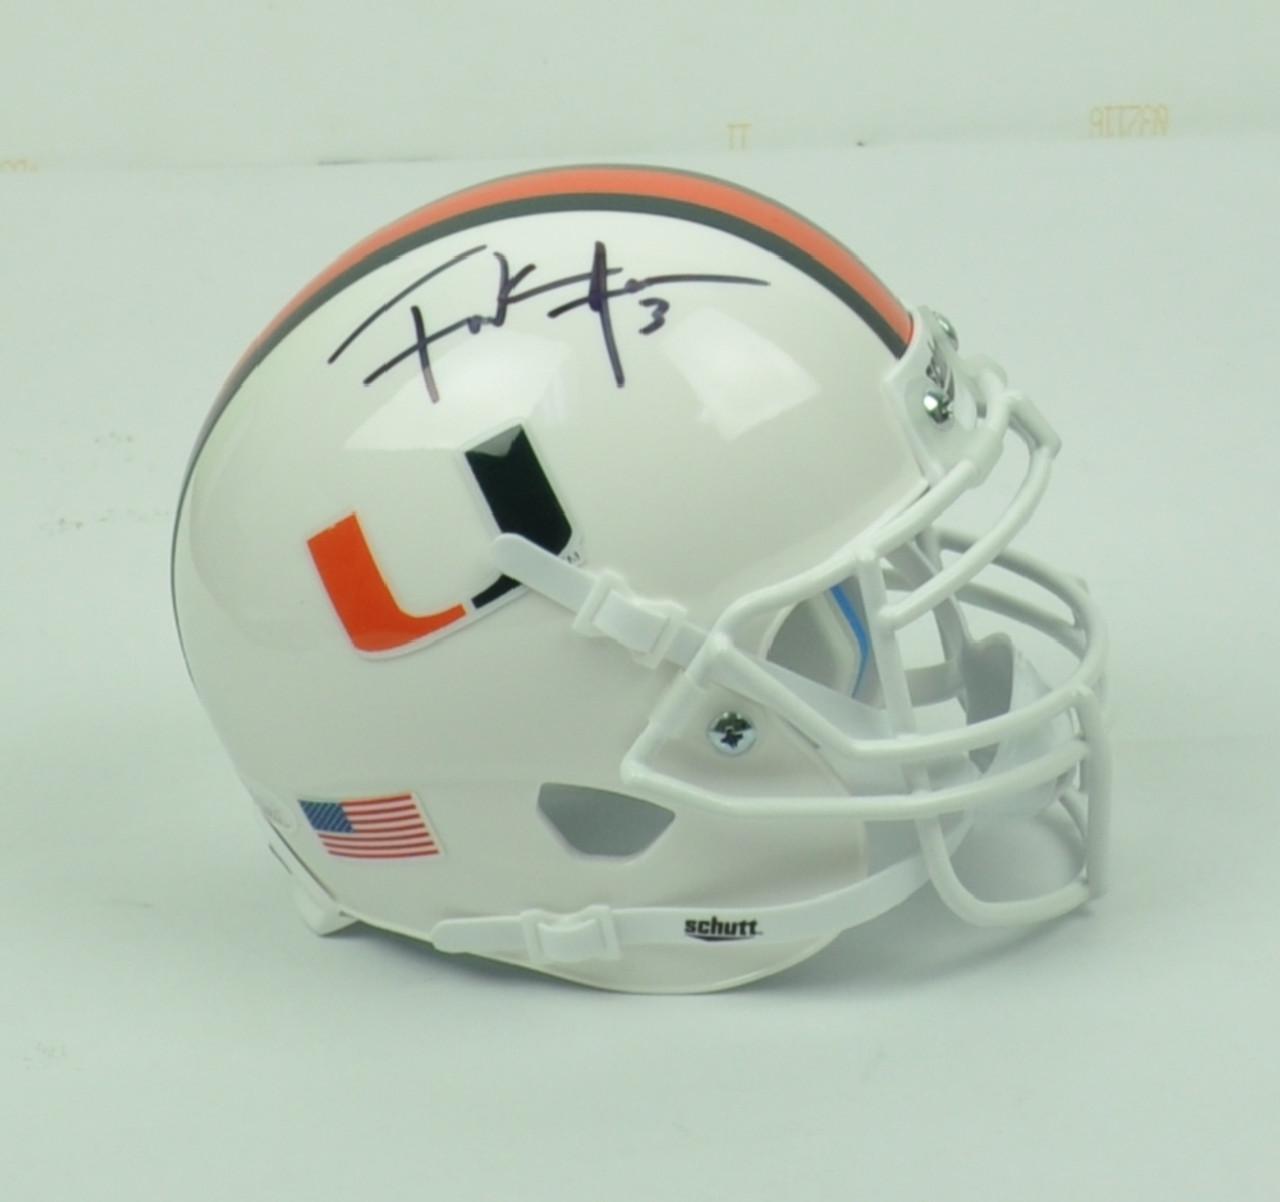 best service 5432a 07383 NCAA Miami Hurricanes Running Back Frank Gore 3 Signed Autographed Schutt  Mini Helmet JSA